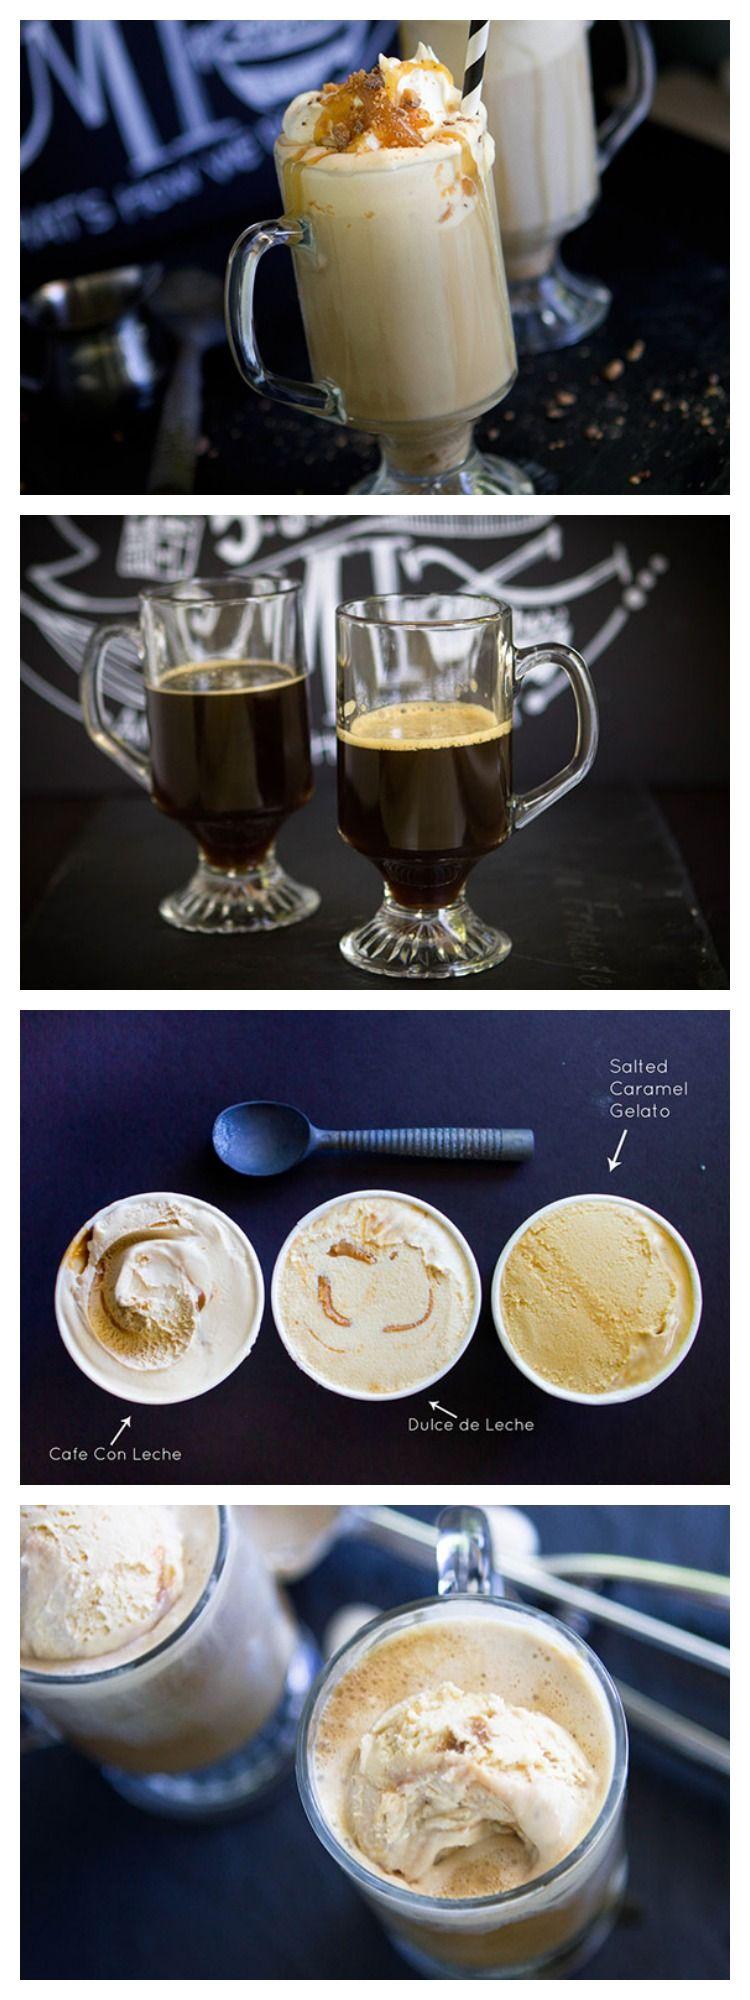 Caramel Ice Cream Coffee Affogato